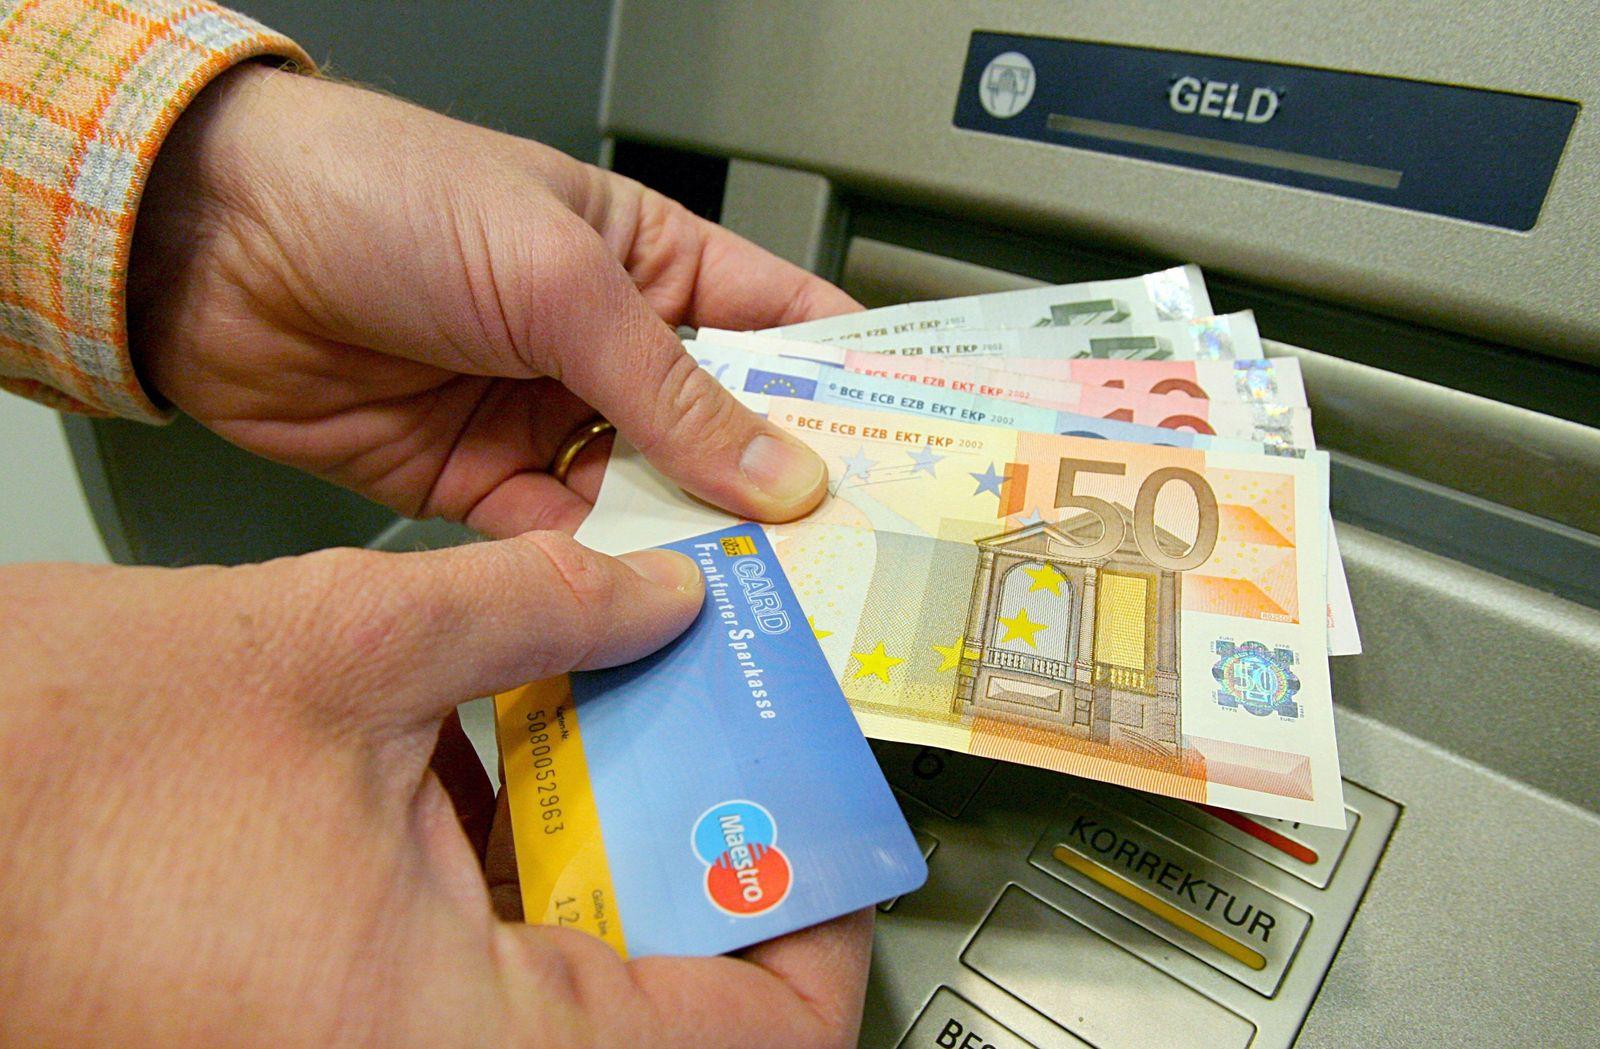 Geldautomat / Geld